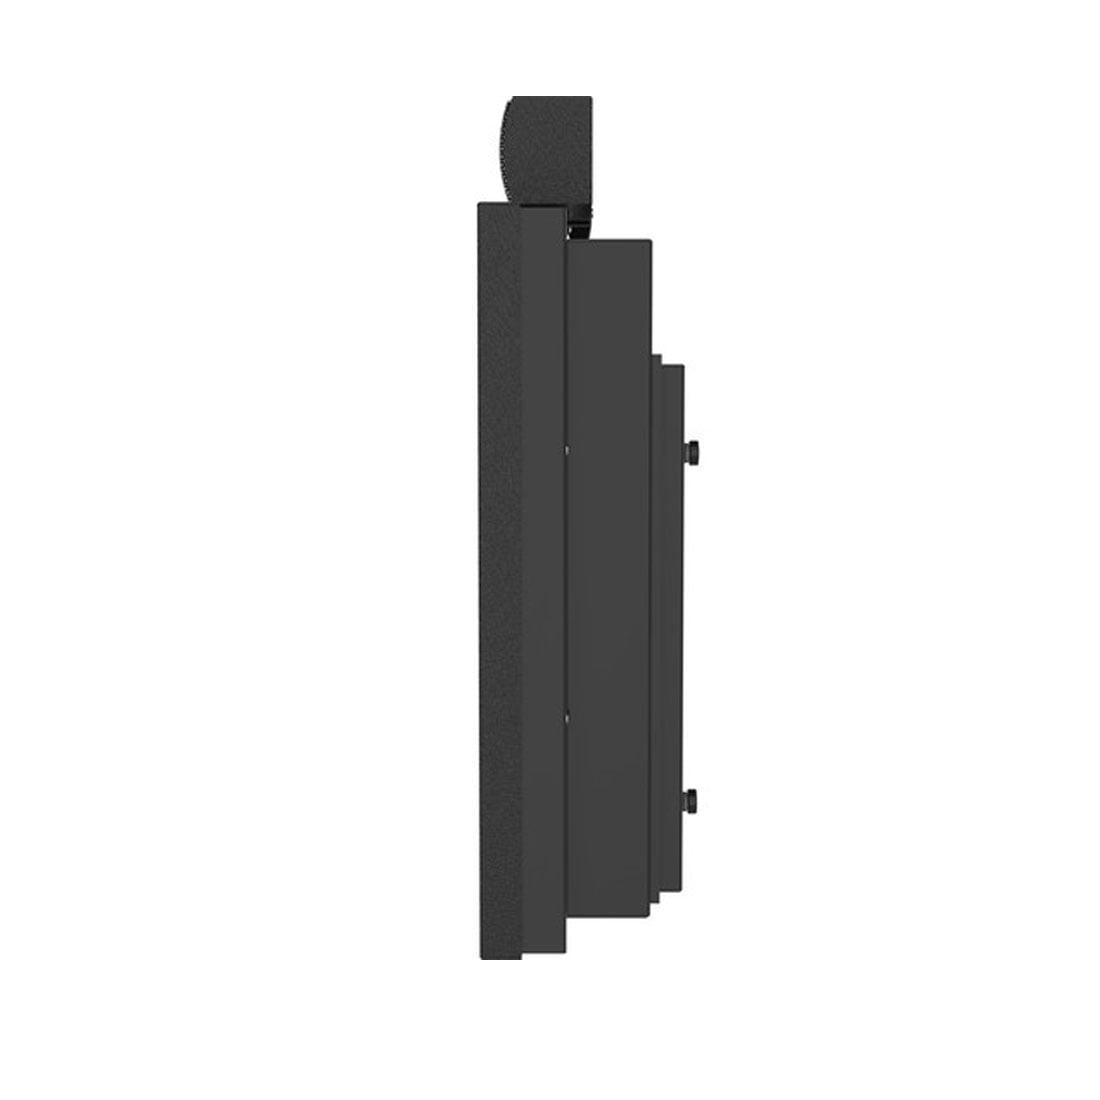 950, pRO 512GB.2 NVMe Vinten Vantage - Revolutionary Compact Robotic